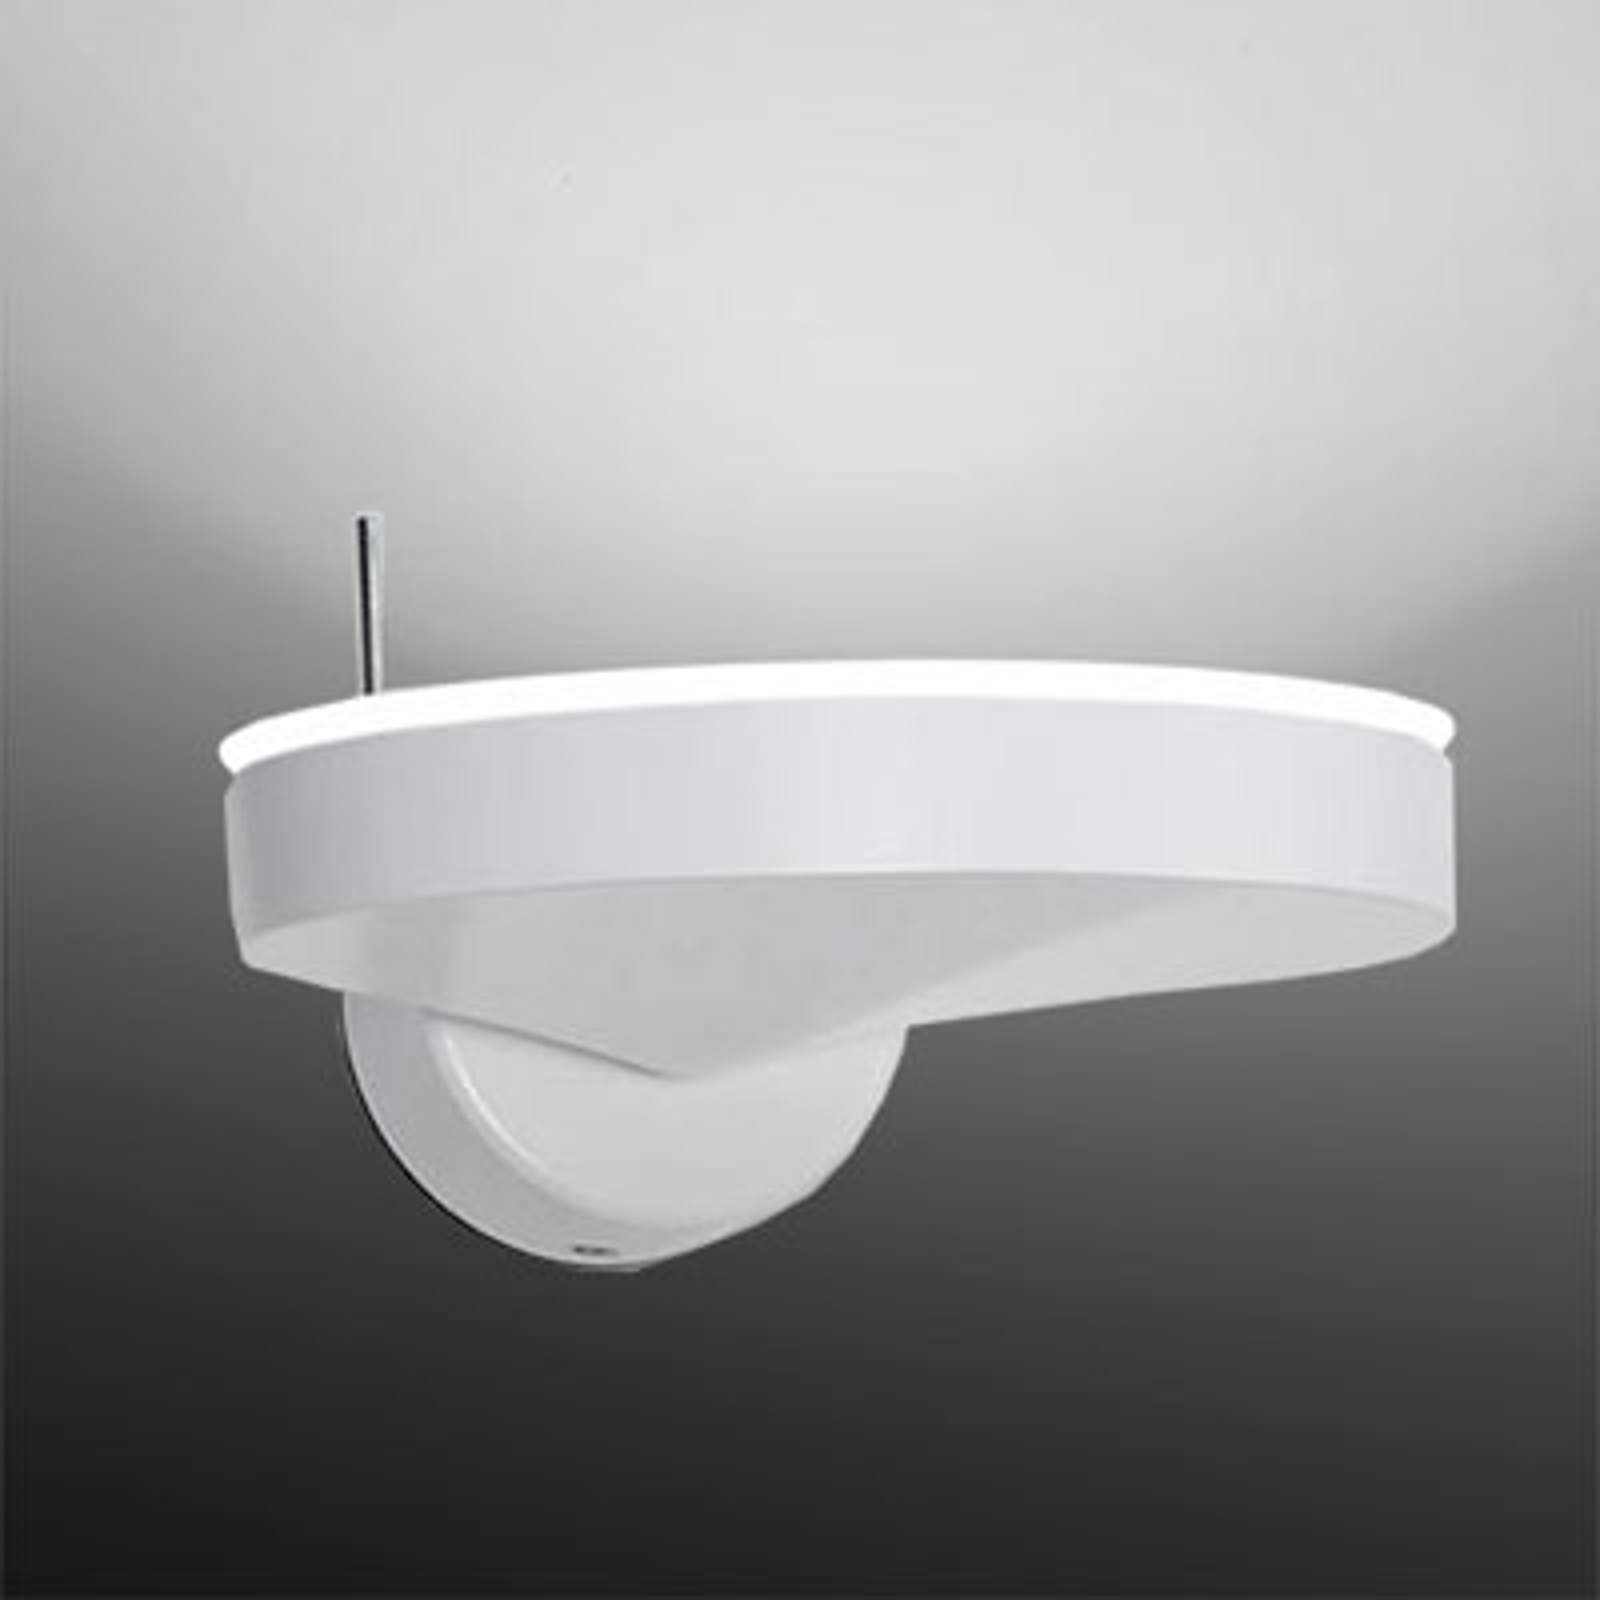 Milan 3-LED - weiße LED-Wandleuchte, 1-flg.